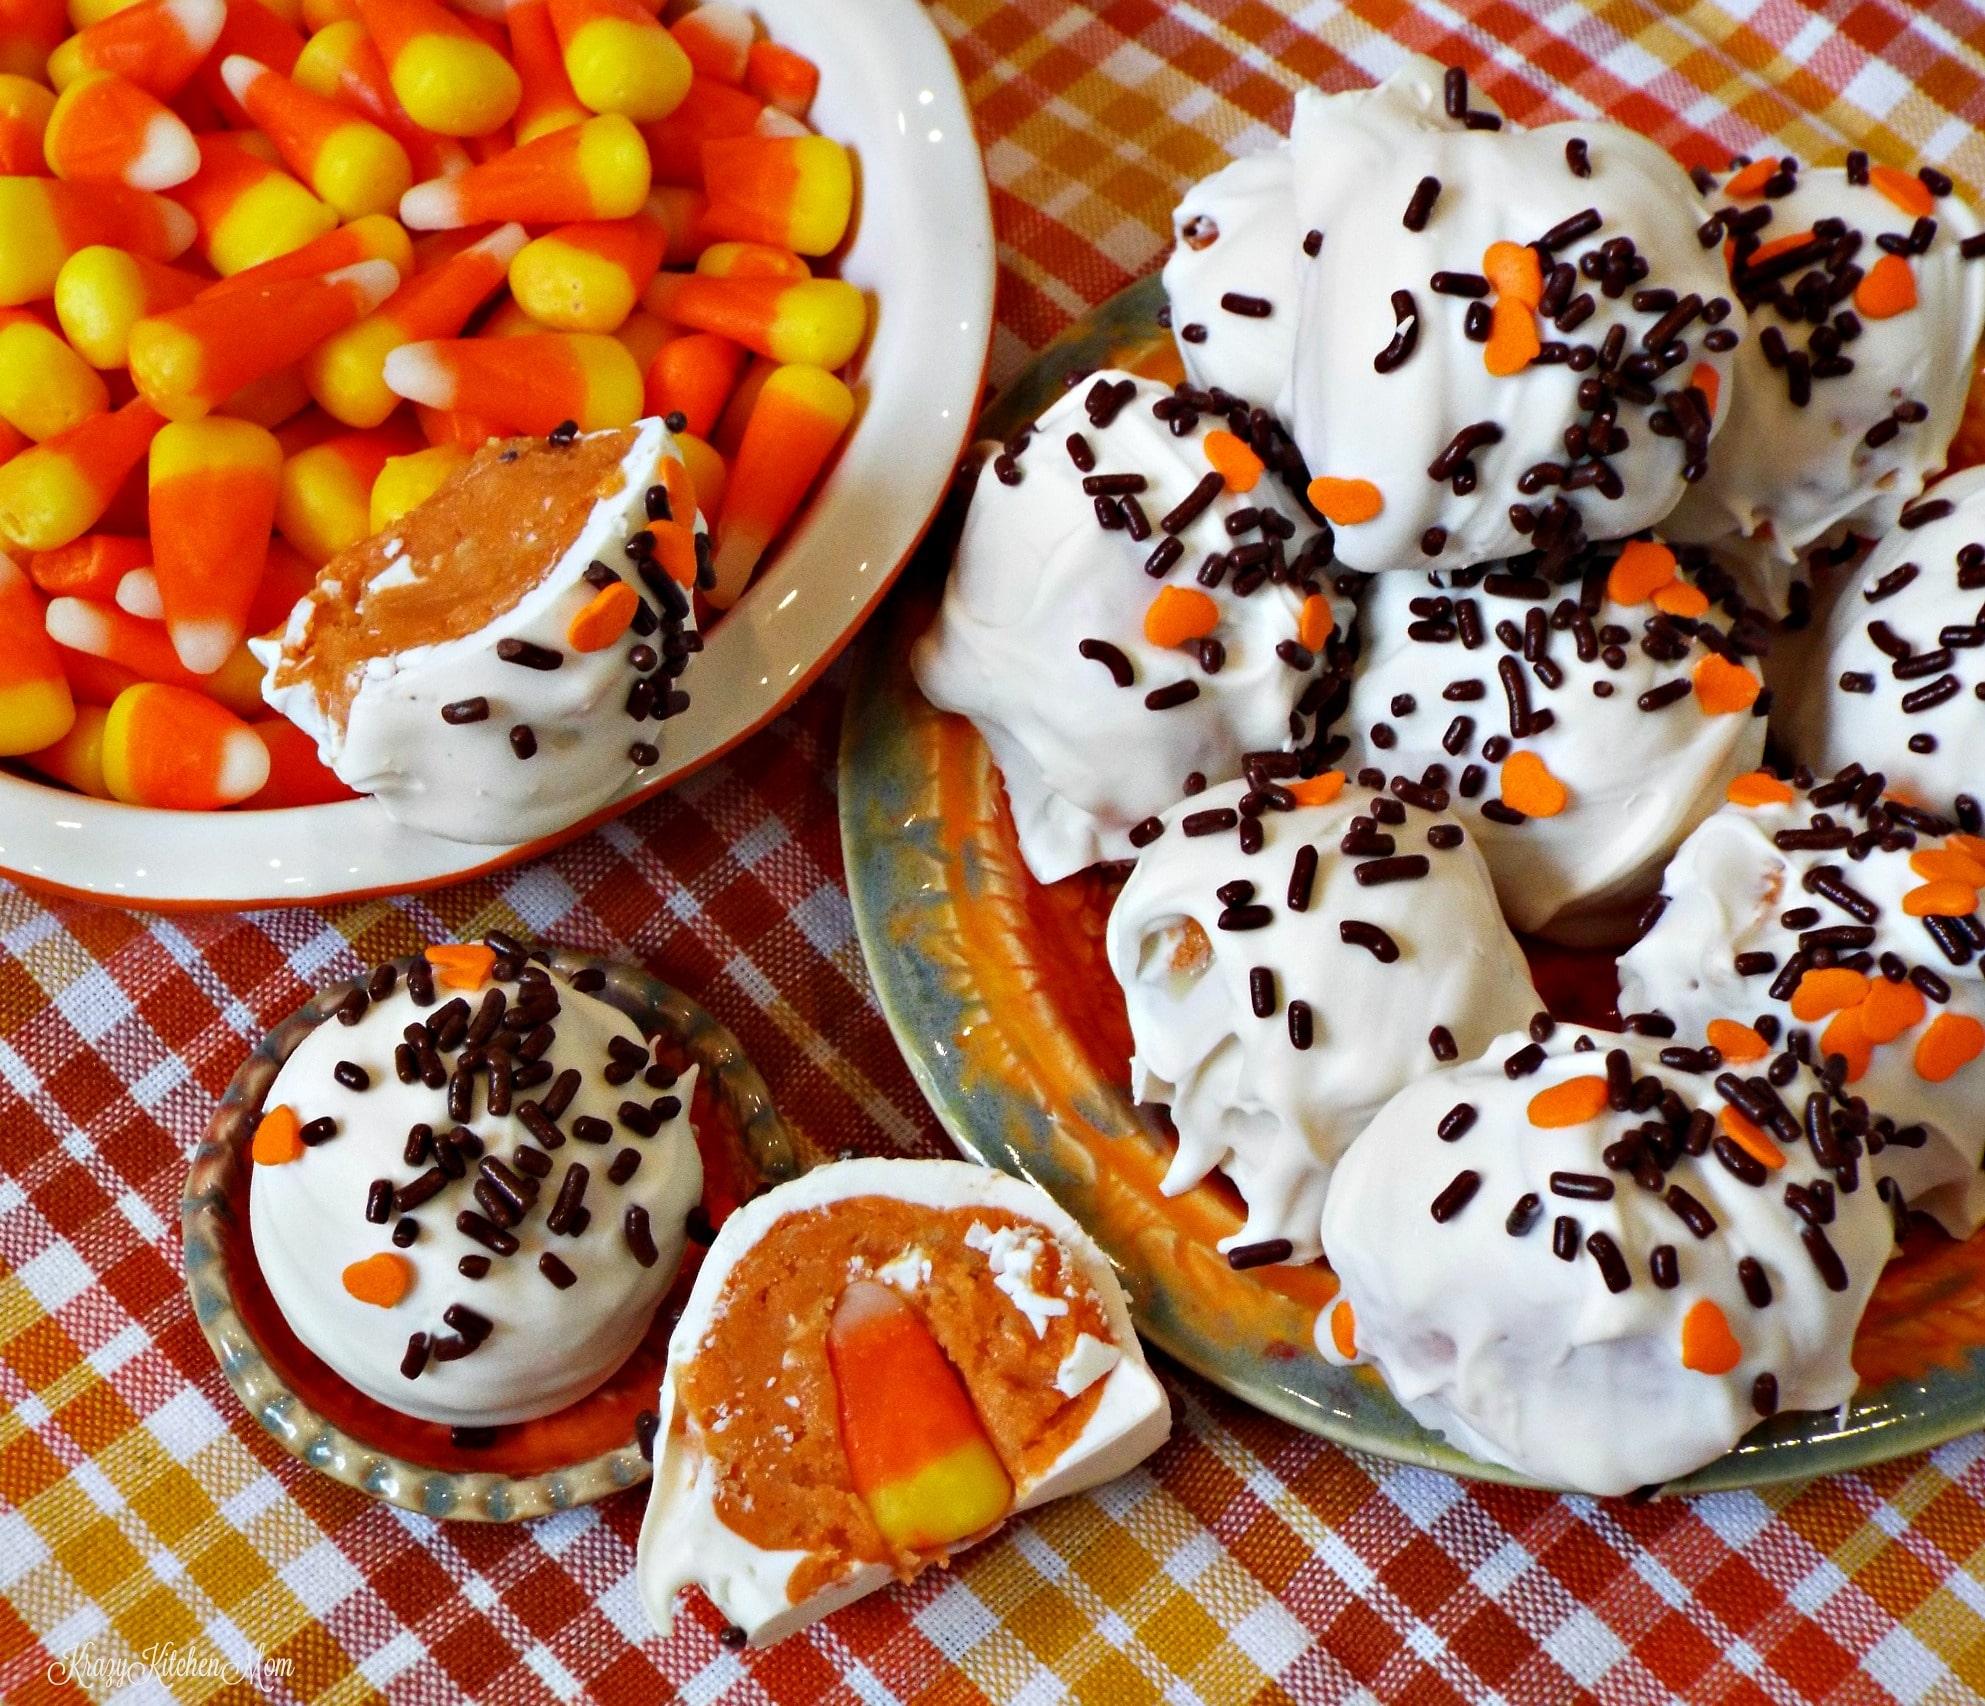 Chocolate Oreos Dunmore Candy Kitchen: Candy Corn Oreo Cookie Balls